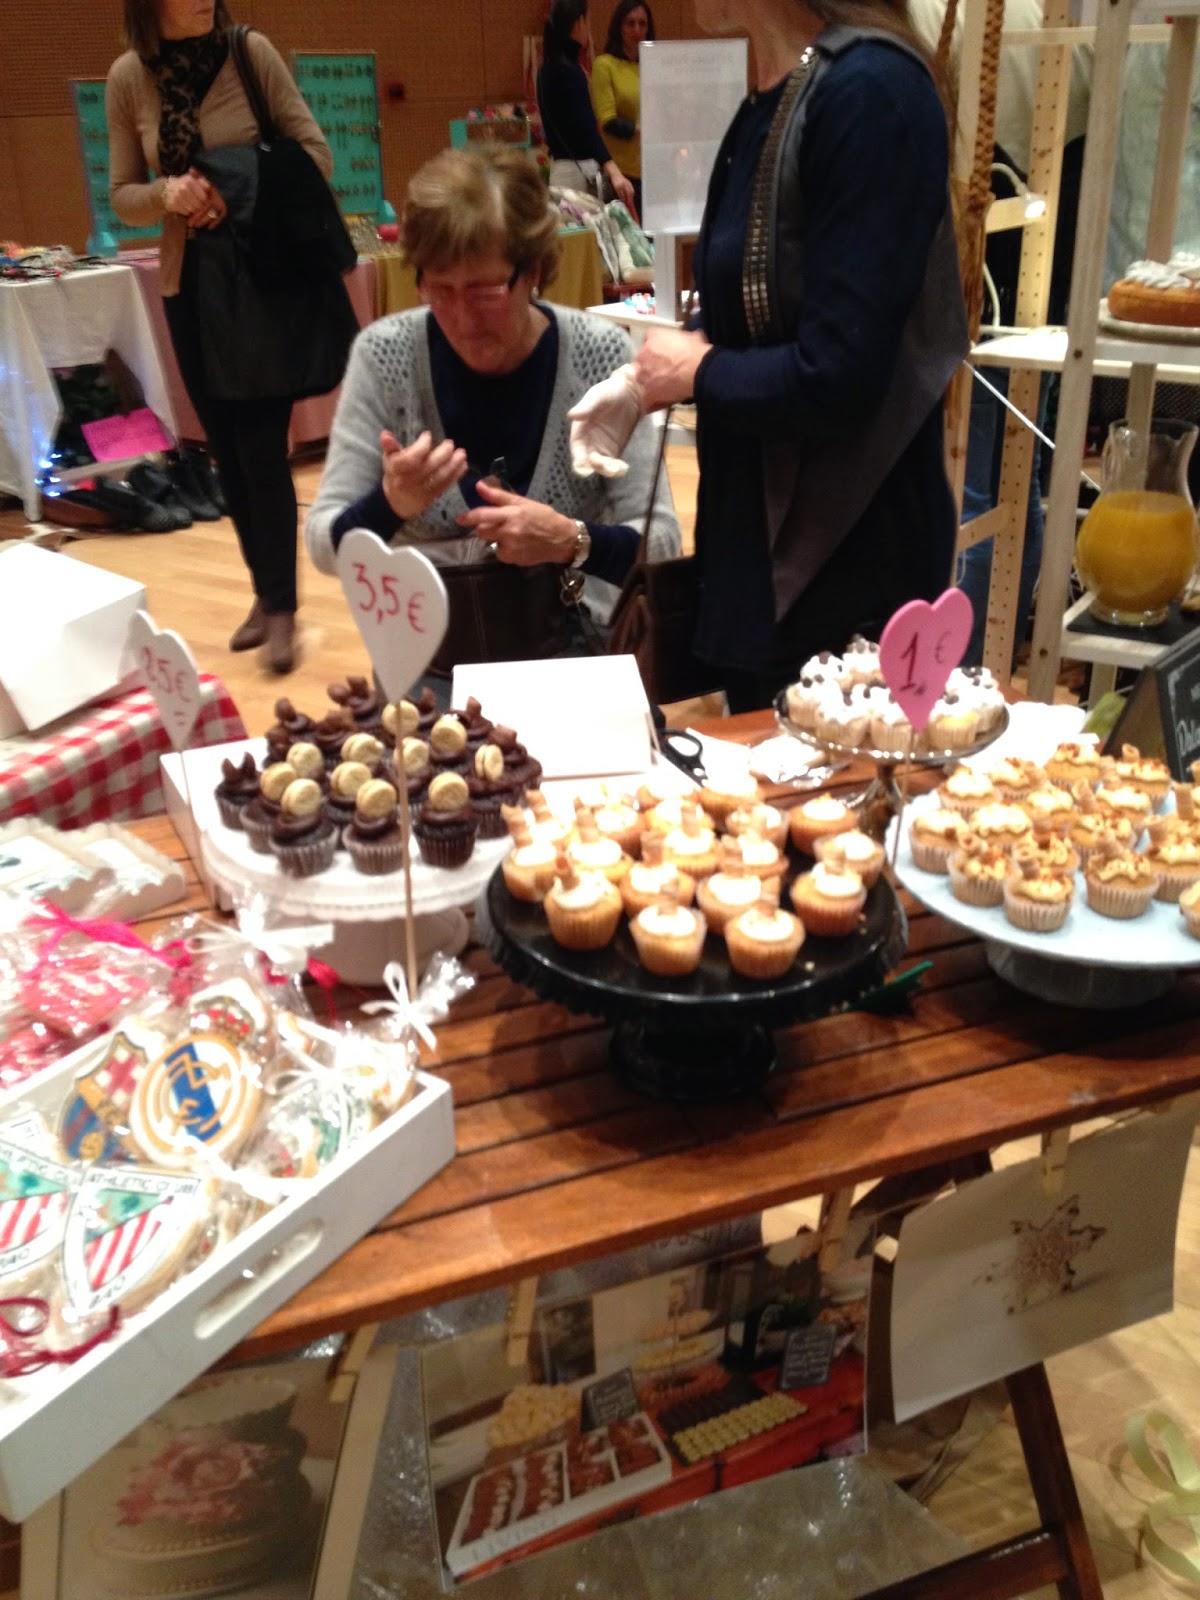 the sunday market Bilbao detalle puesto cupcakes